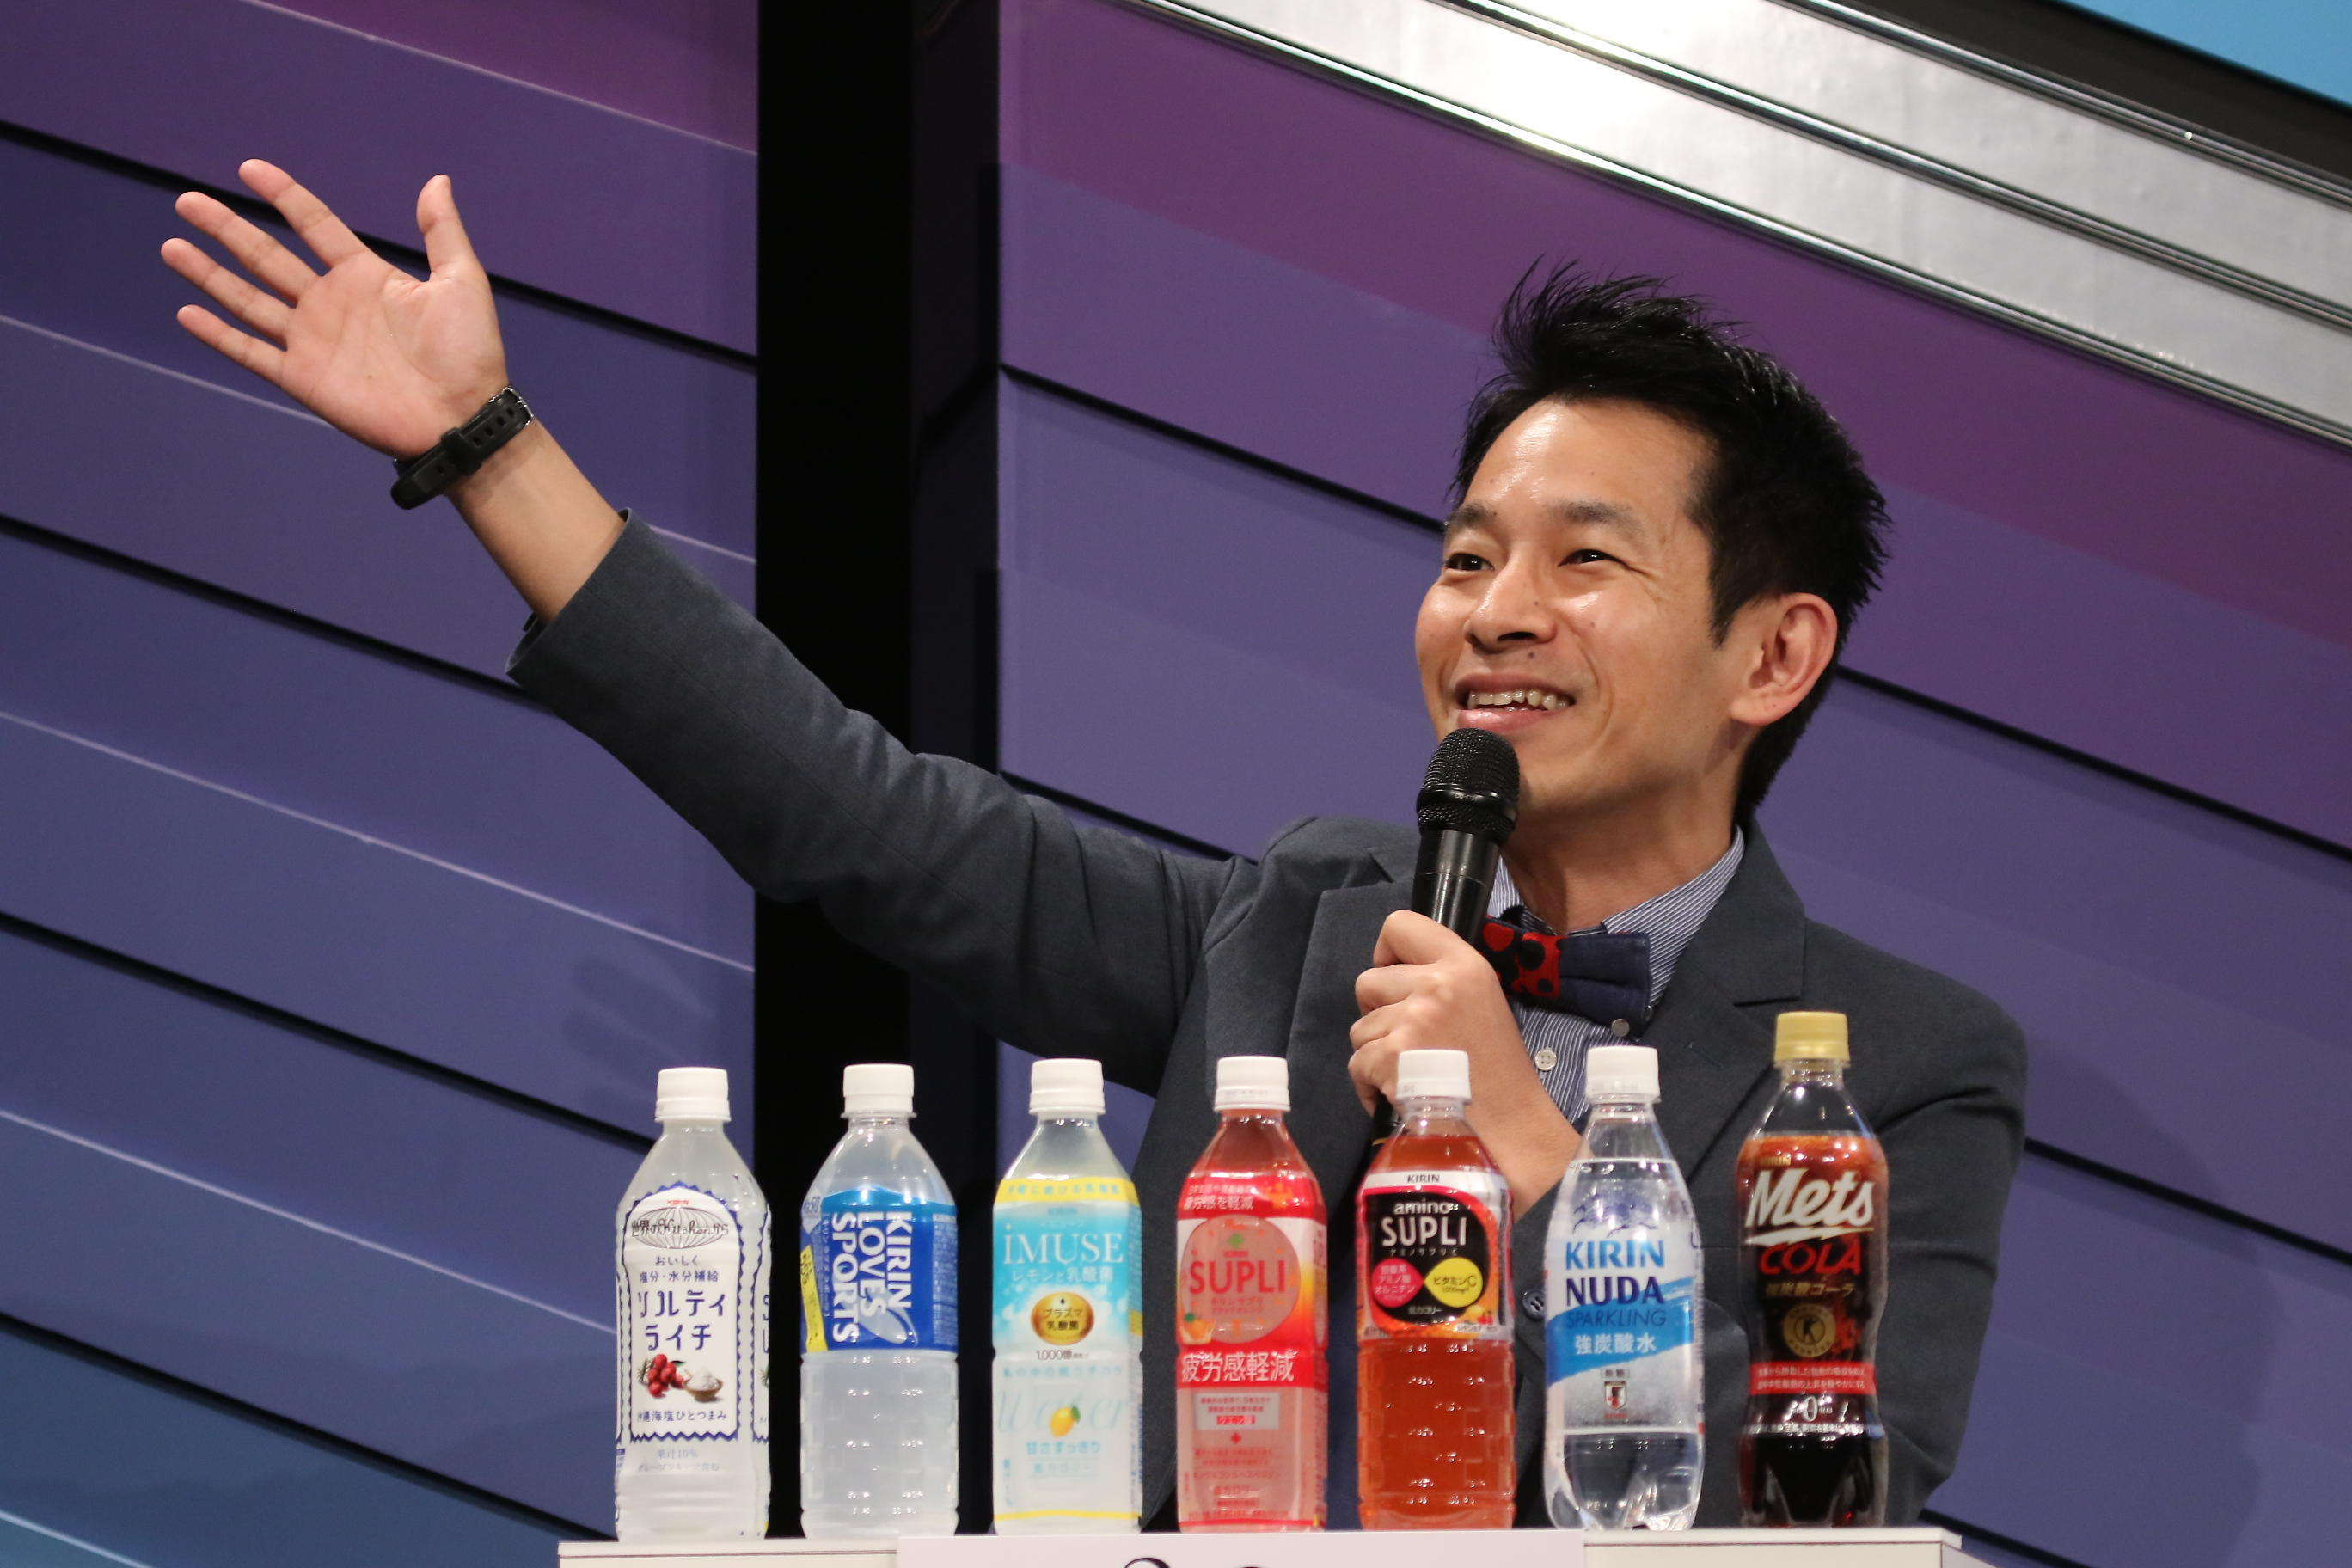 http://news.yoshimoto.co.jp/20190131141217-561618d312fede54789bc45dfddce0e4ba4d3bd7.jpg